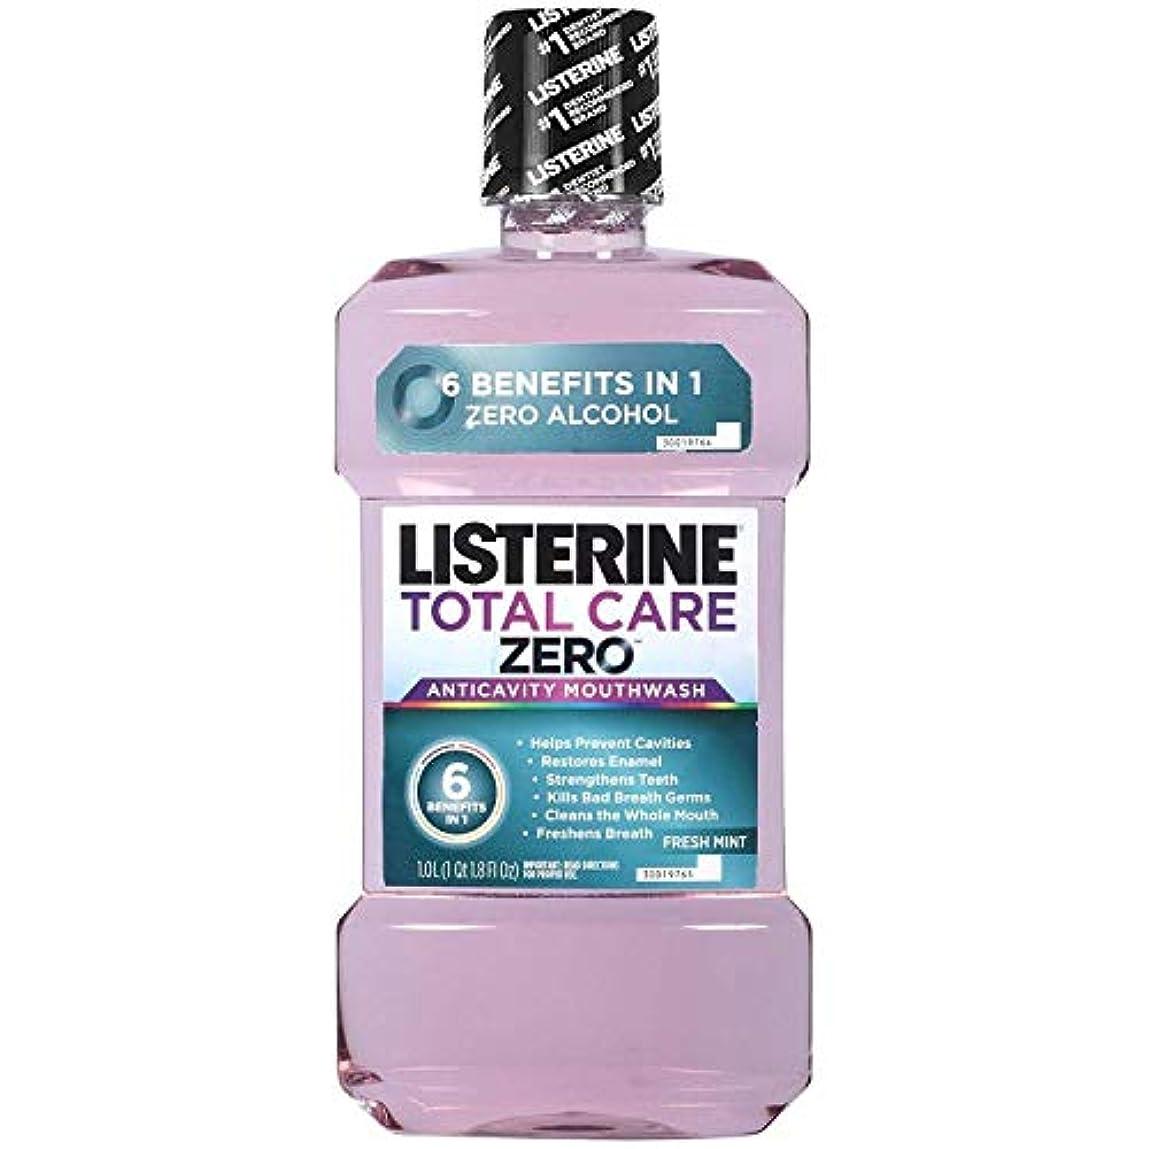 Listerine ゼロトータルケアサイズ33.8Oトータルケアゼロ虫歯予防マウスウォッシュフレッシュミント1リットル/ 33.8Flオズ